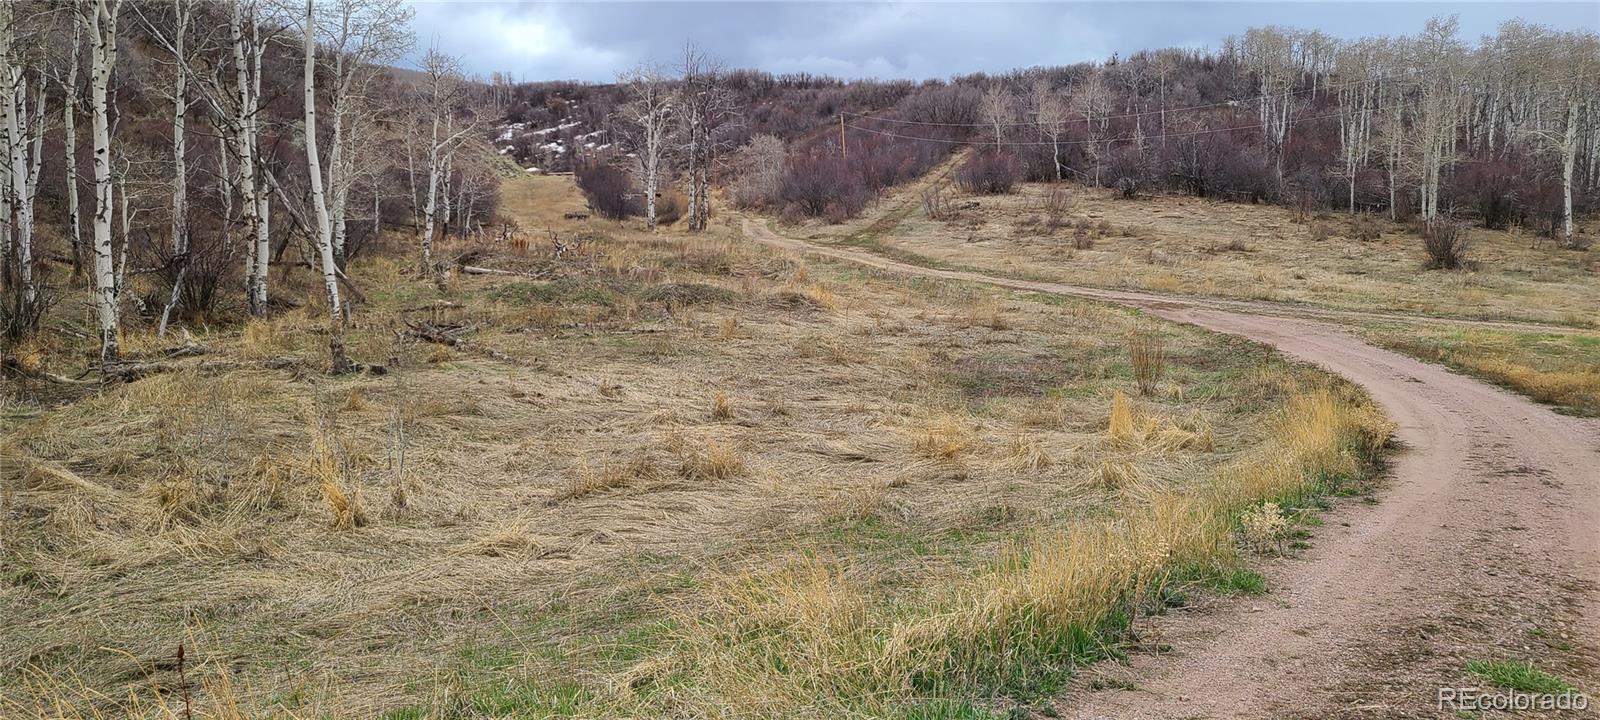 26000 Old Springs Road Property Photo - Oak Creek, CO real estate listing